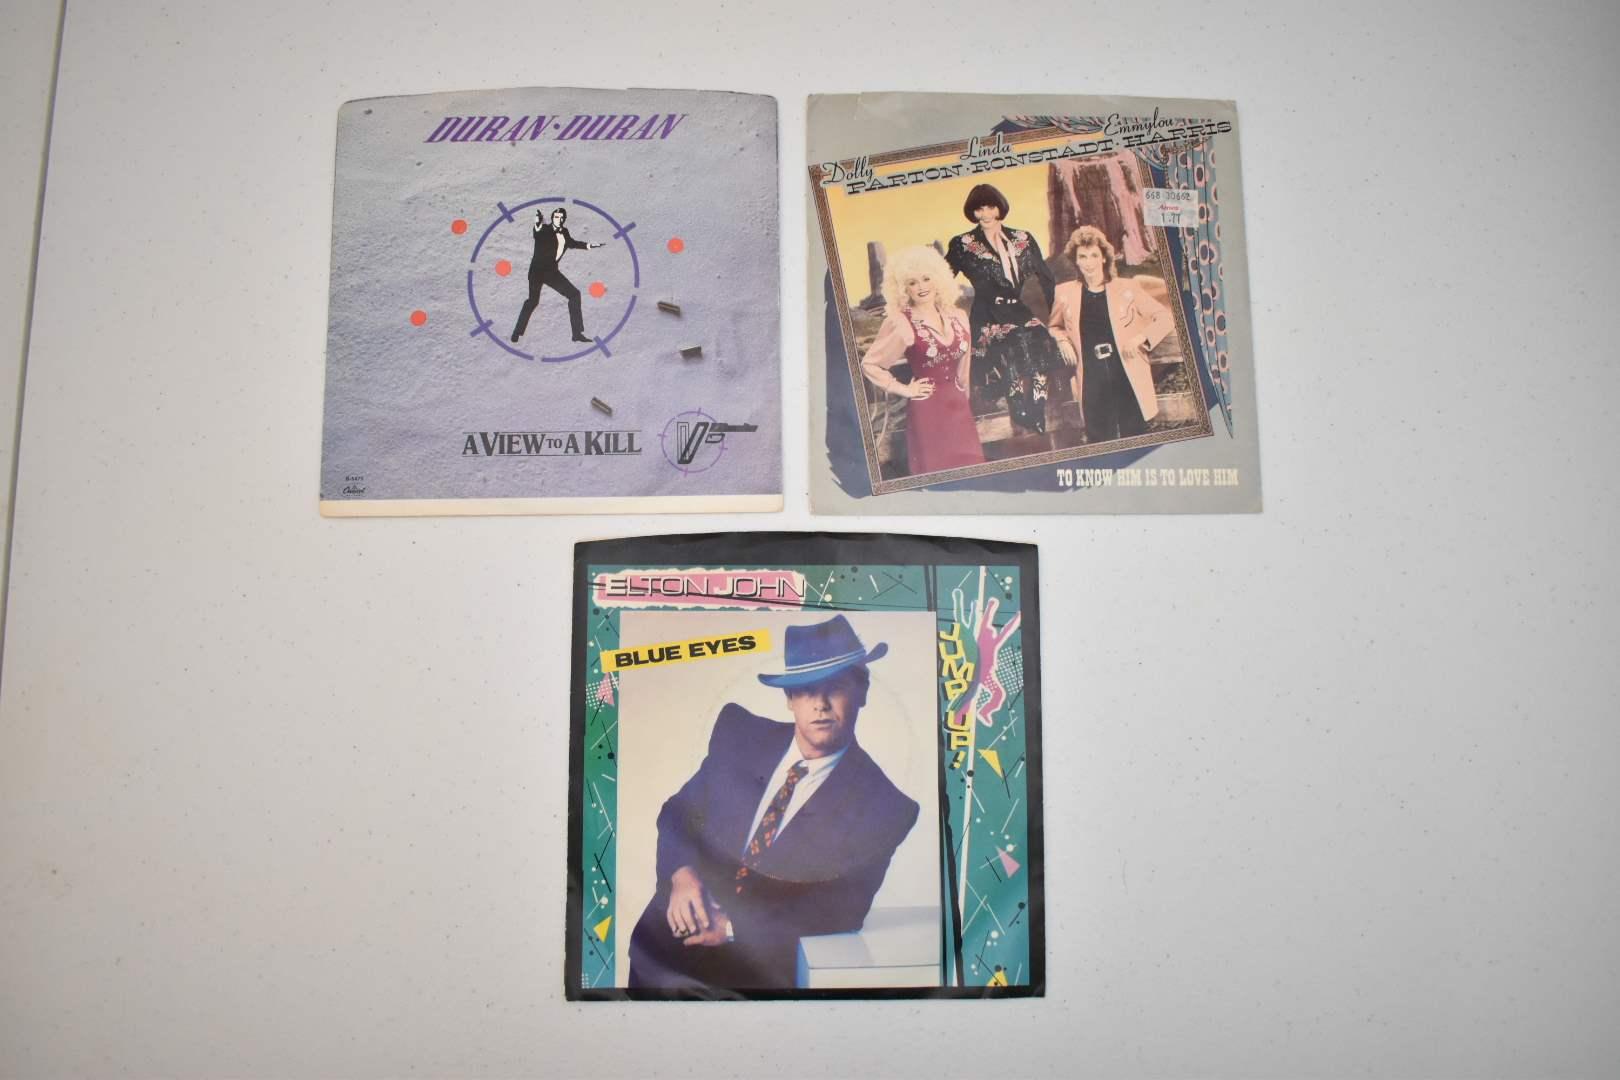 Vinyls: Elton John, Duran Duran, Dolly Parton